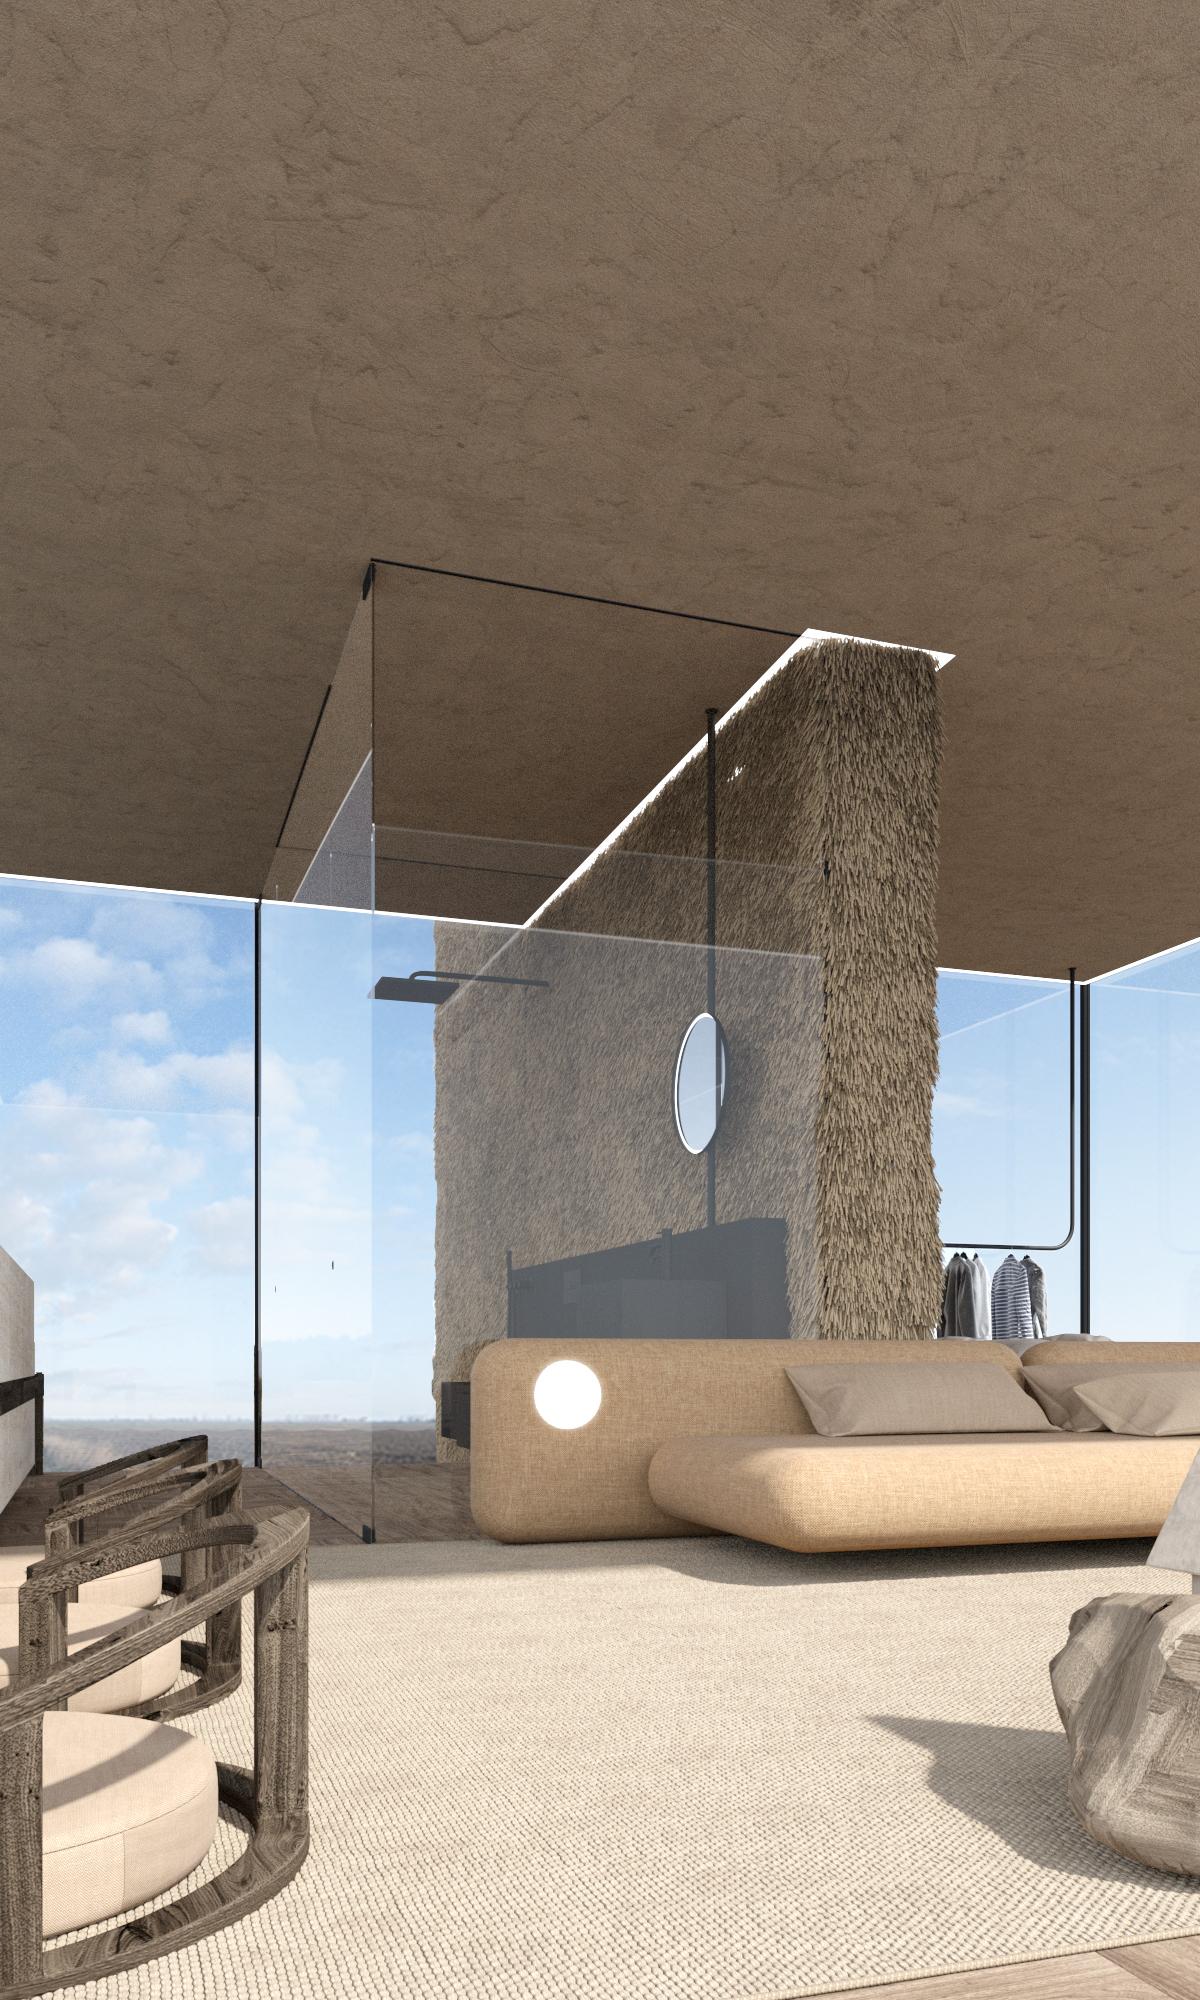 sofa design for a cabin house